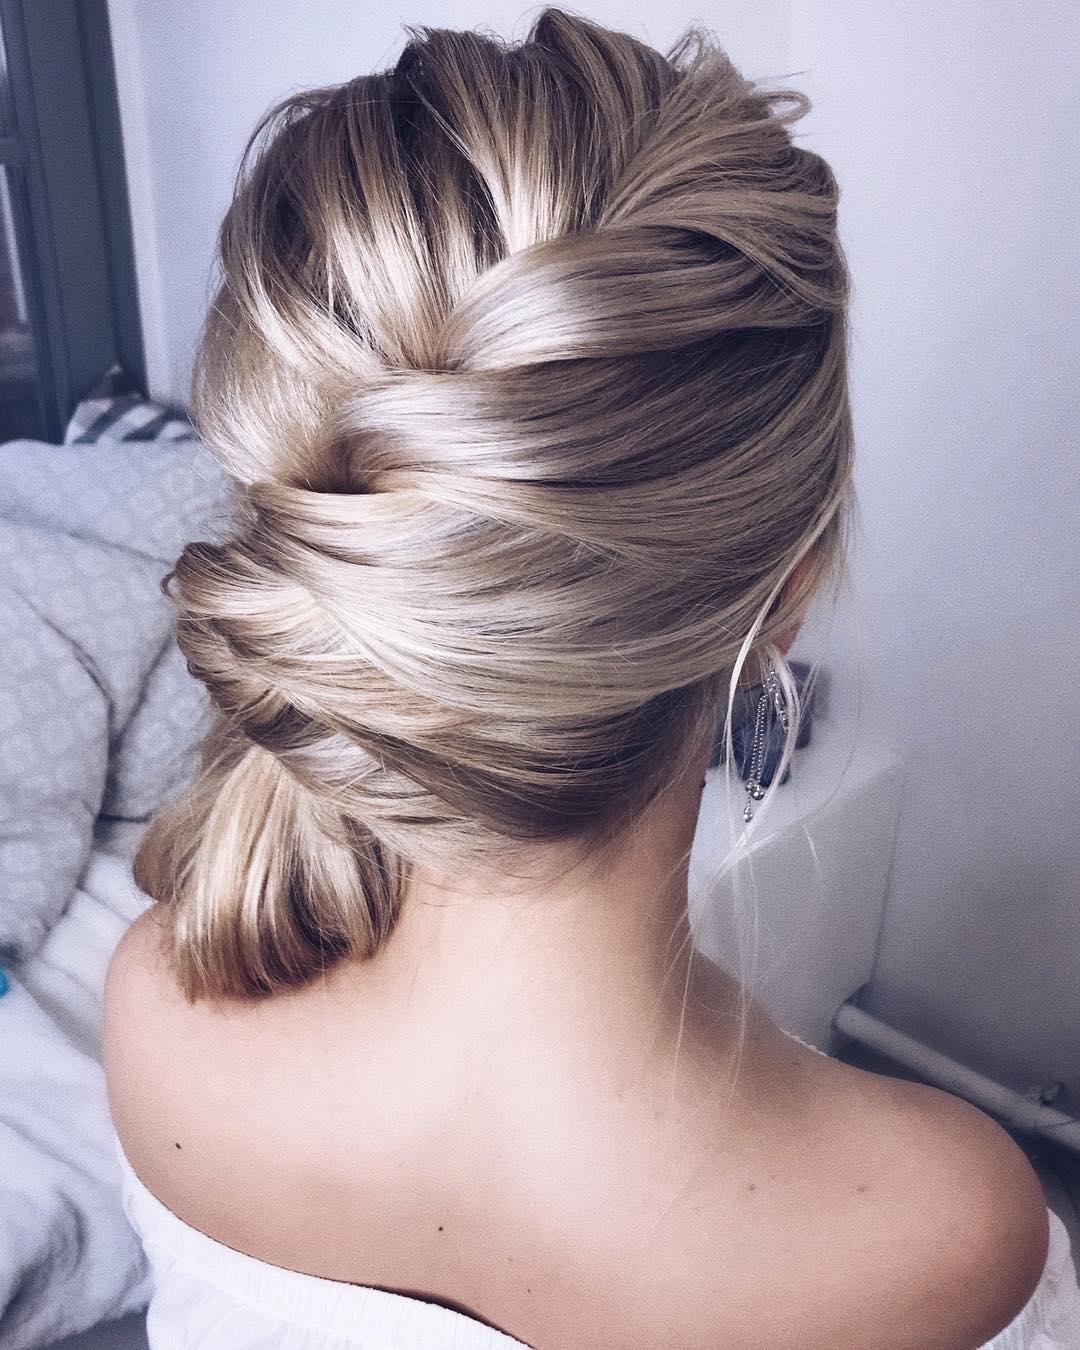 причёски для коротких волос фото 20